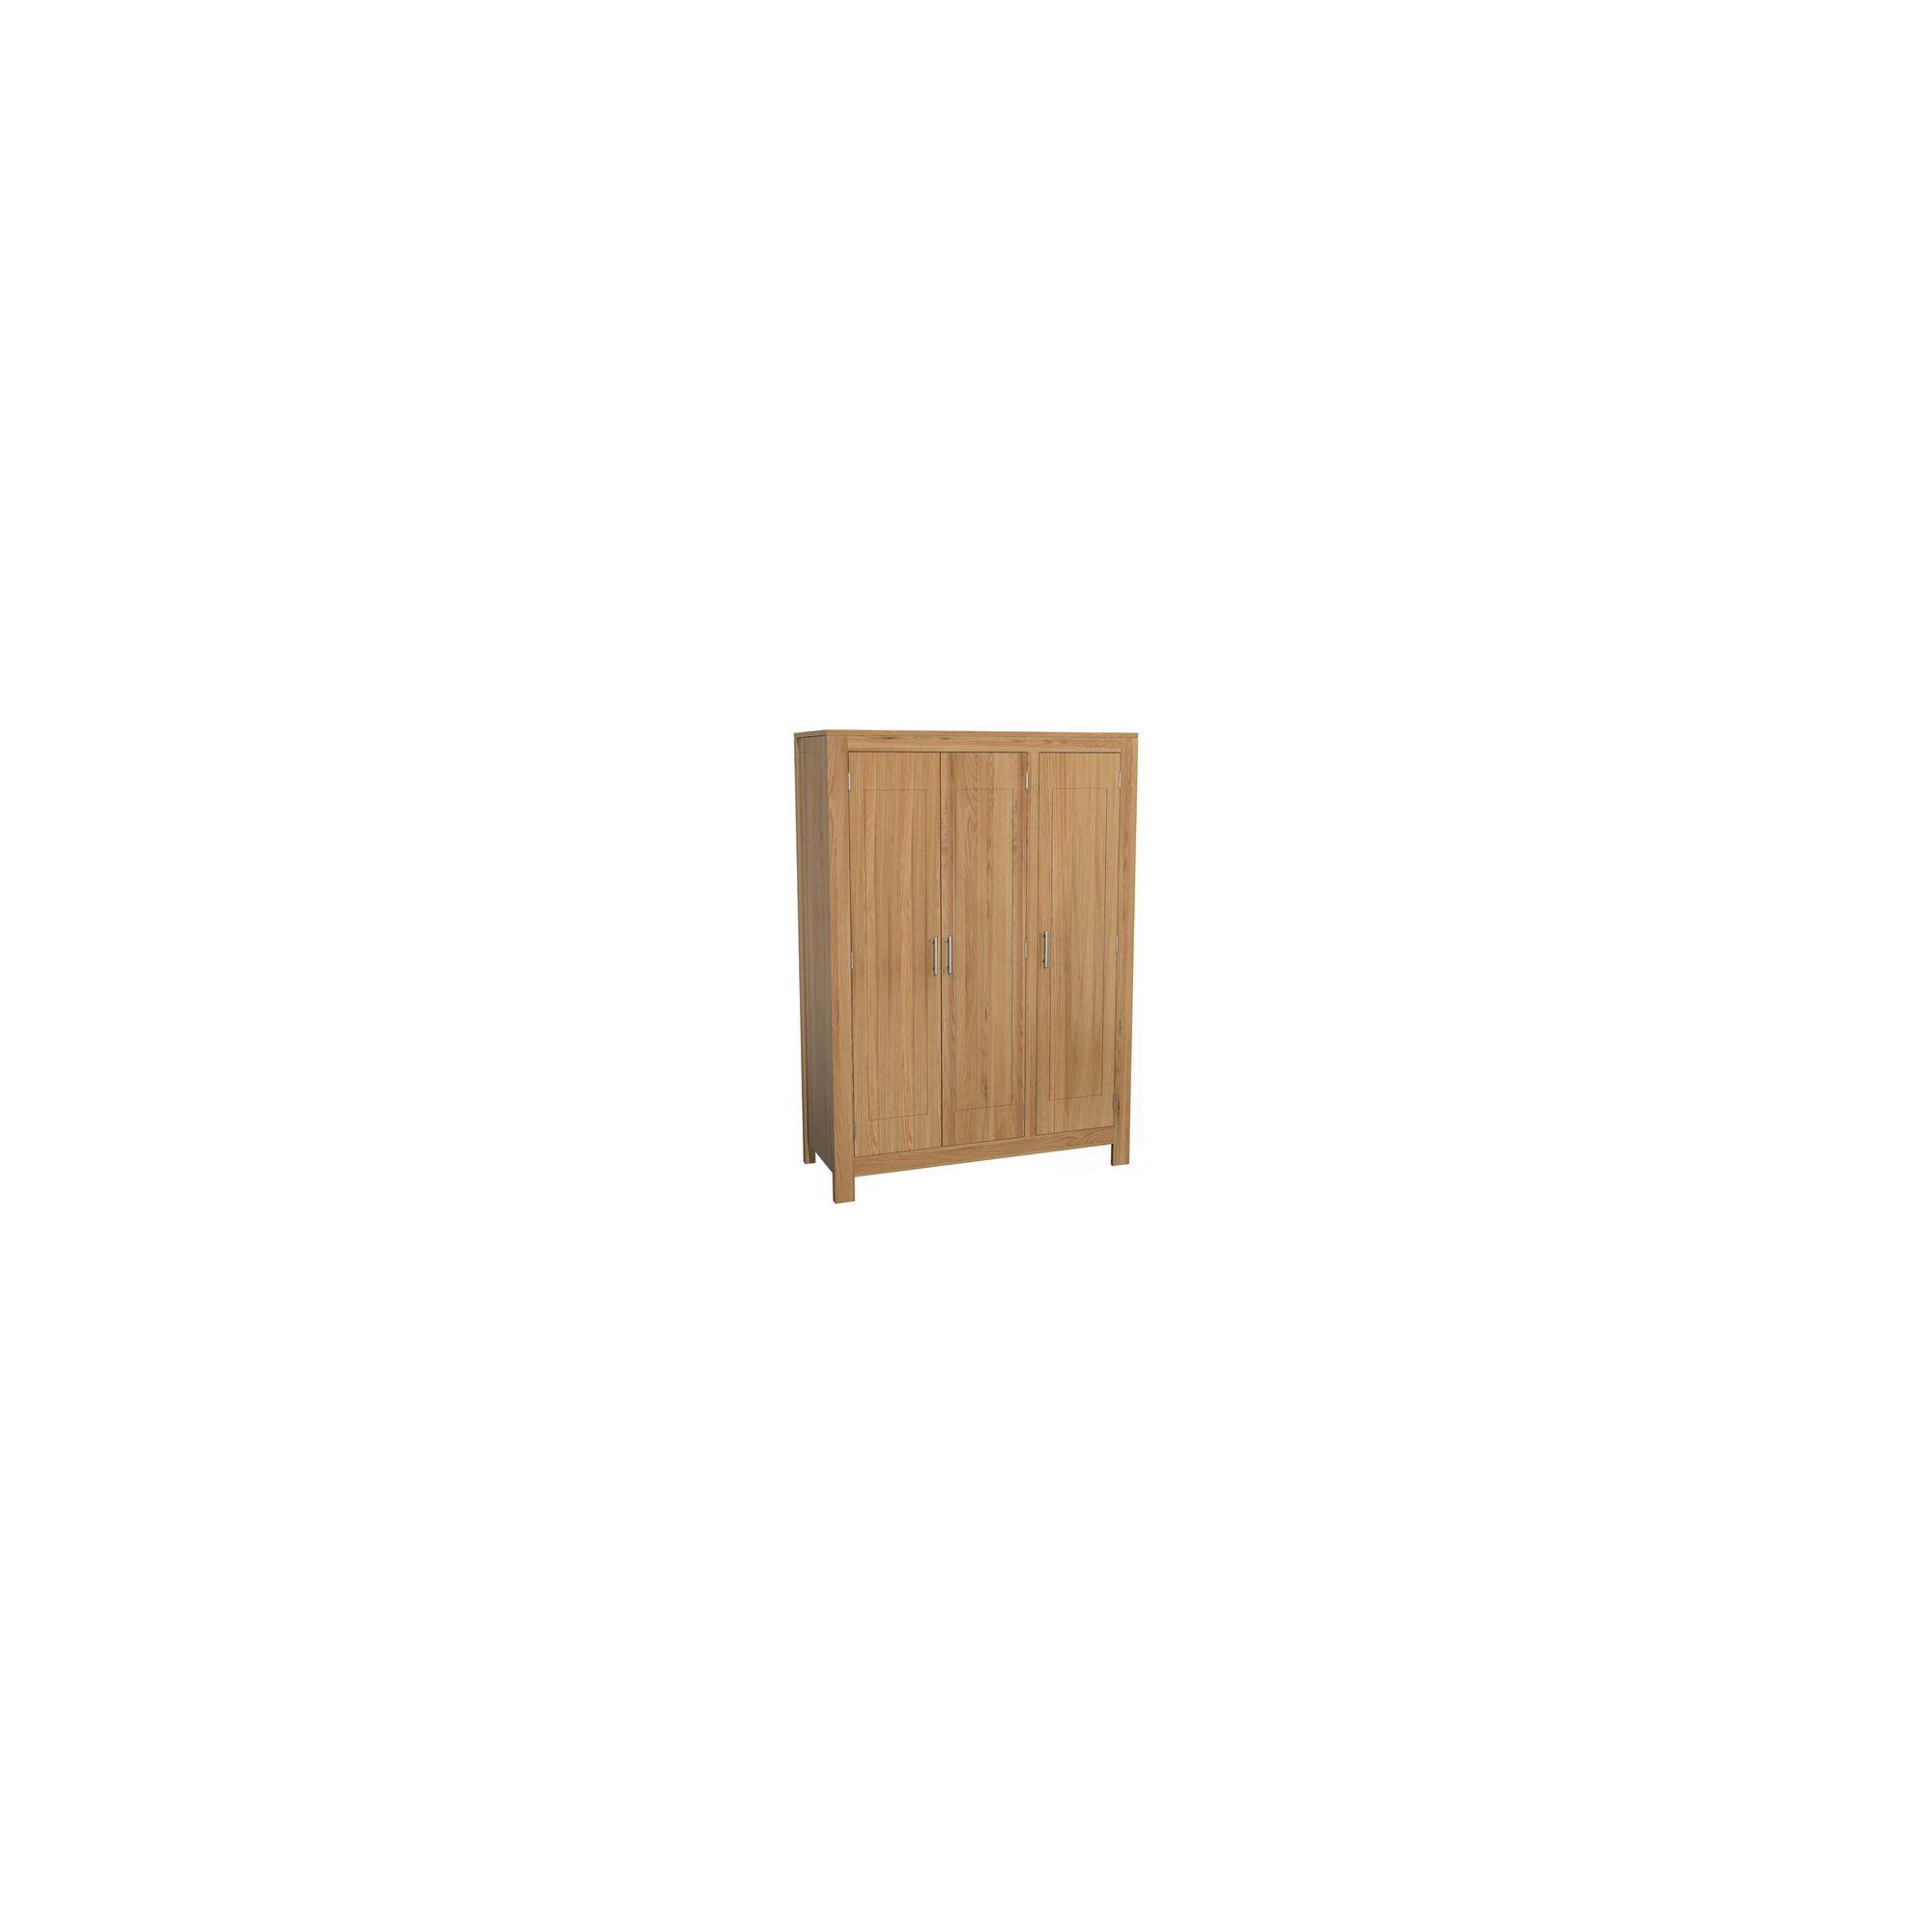 Kelburn Furniture Milano Triple Wardrobe in Clear Satin Lacquer at Tescos Direct